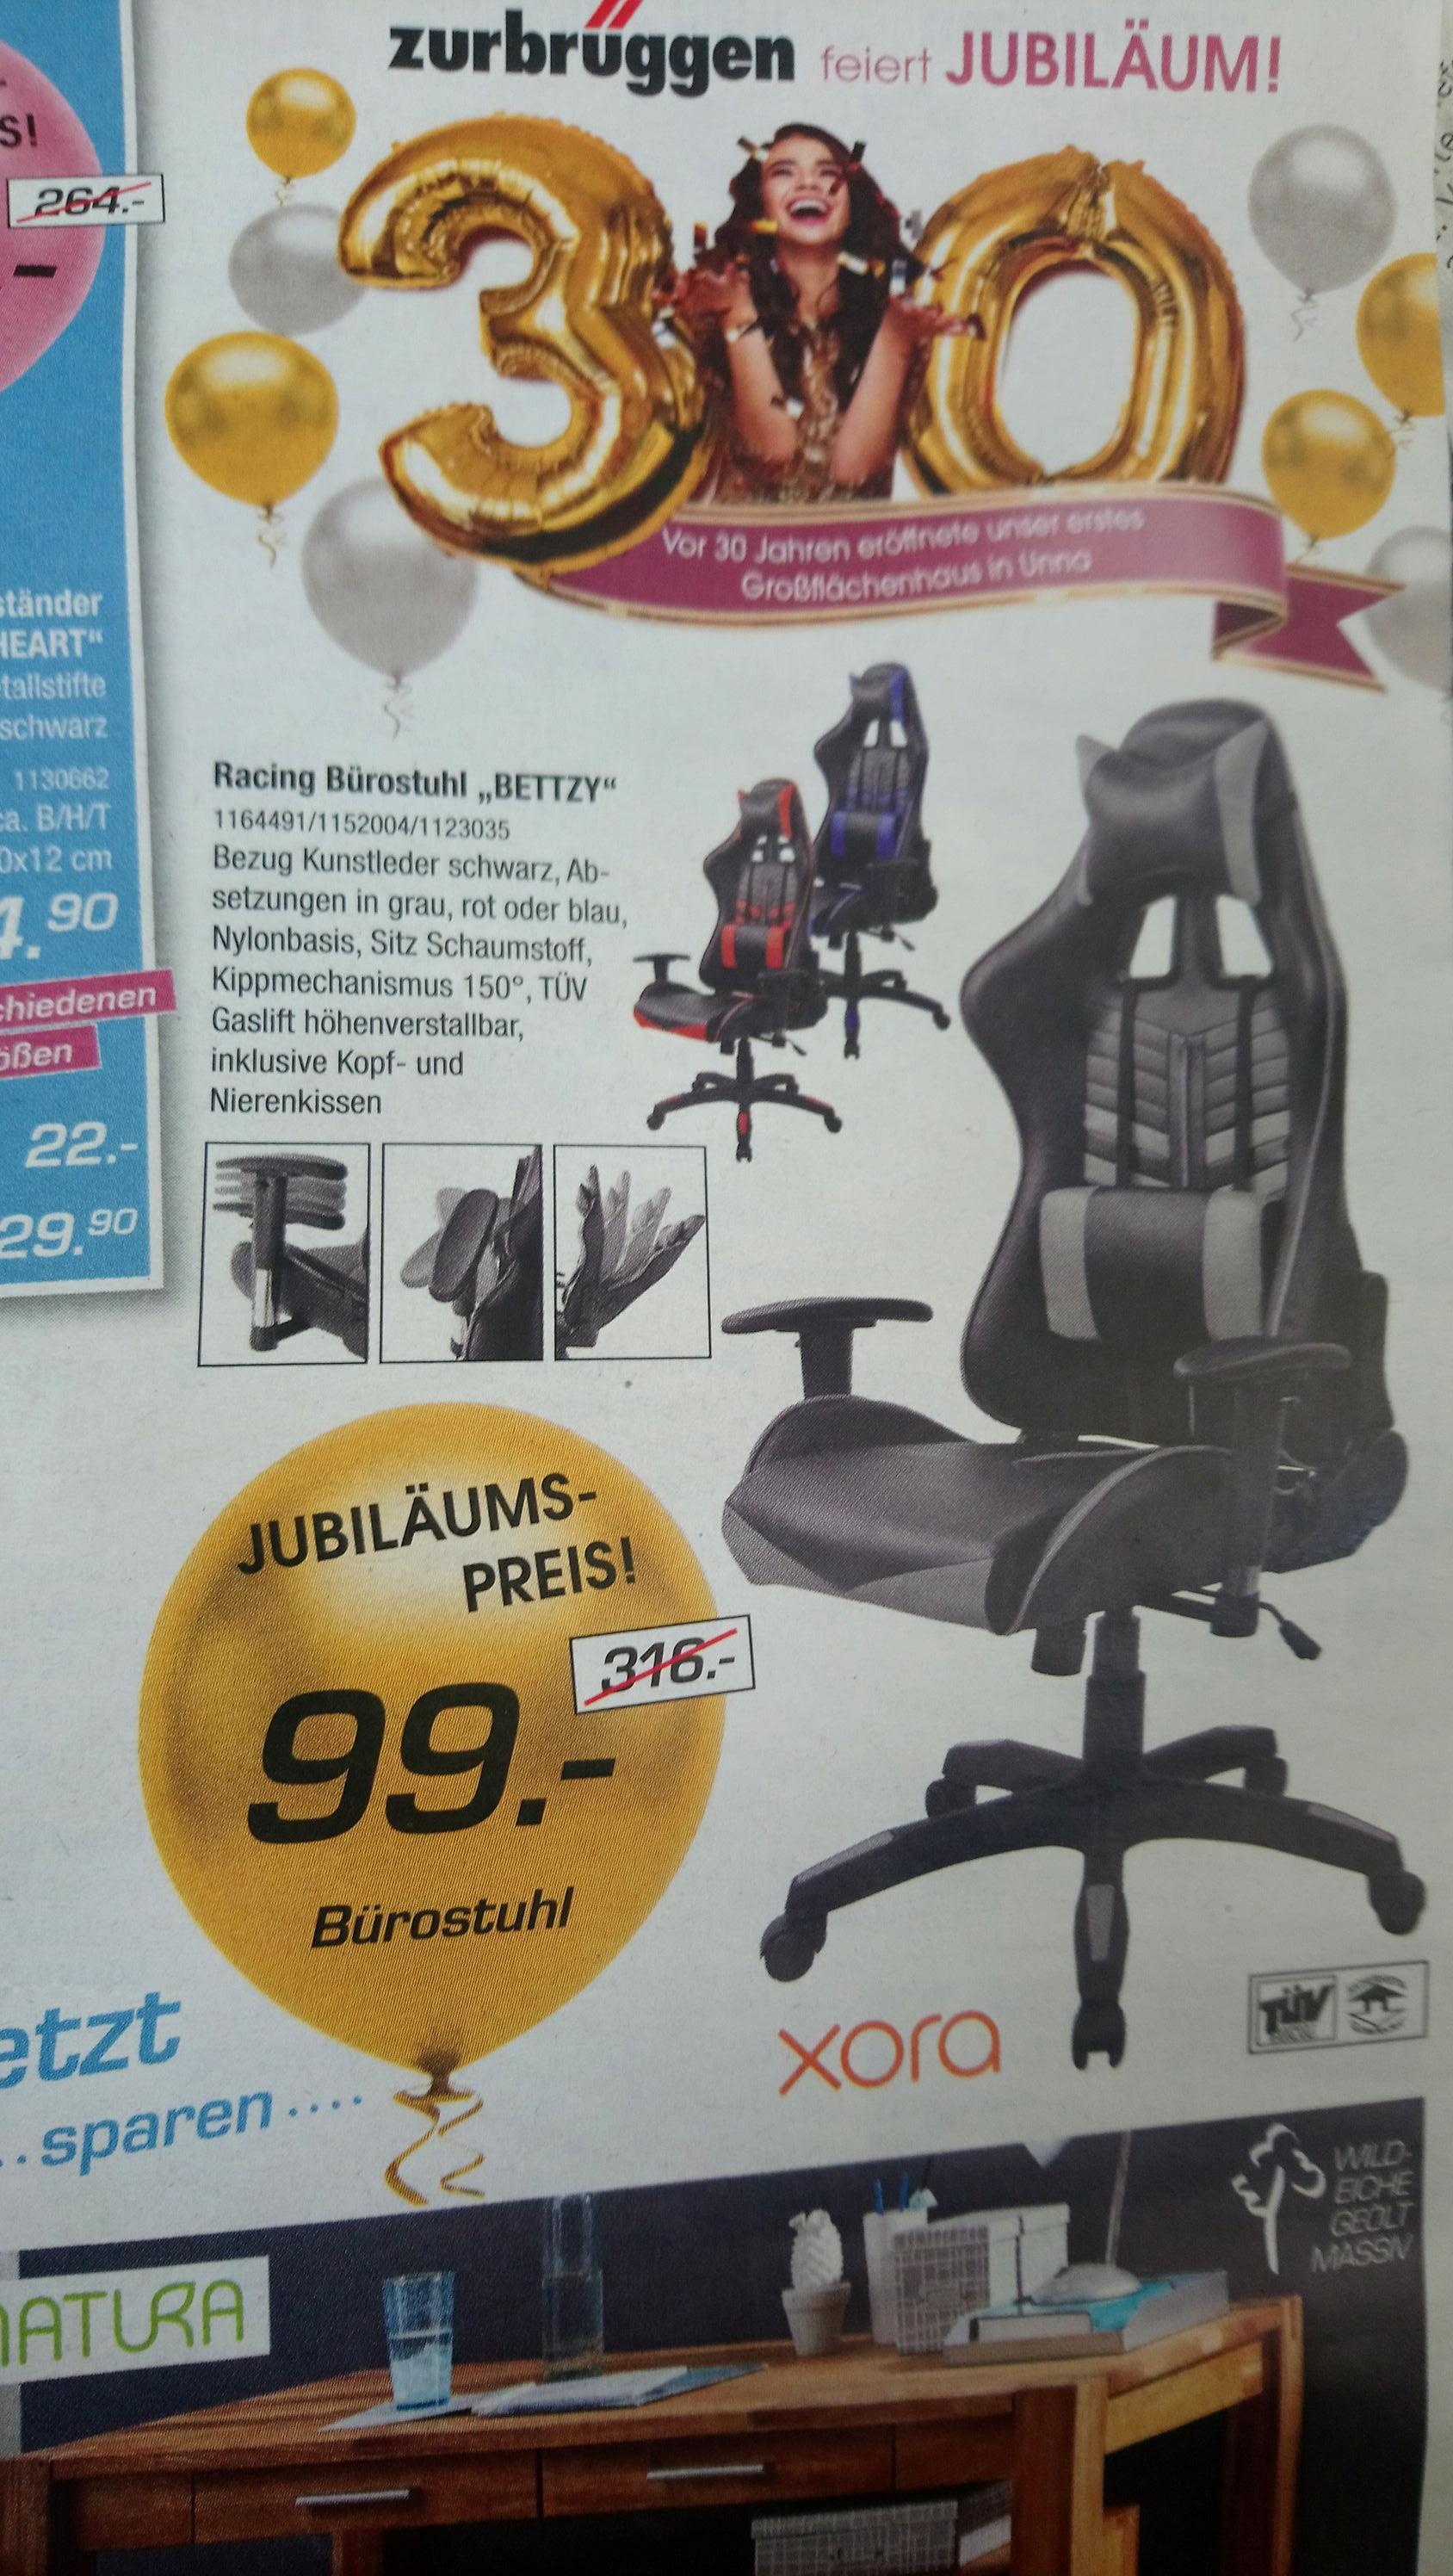 29 99€ Gaming Stuhl Zurbrüggen Bürostuhlversand pqSzUMVG